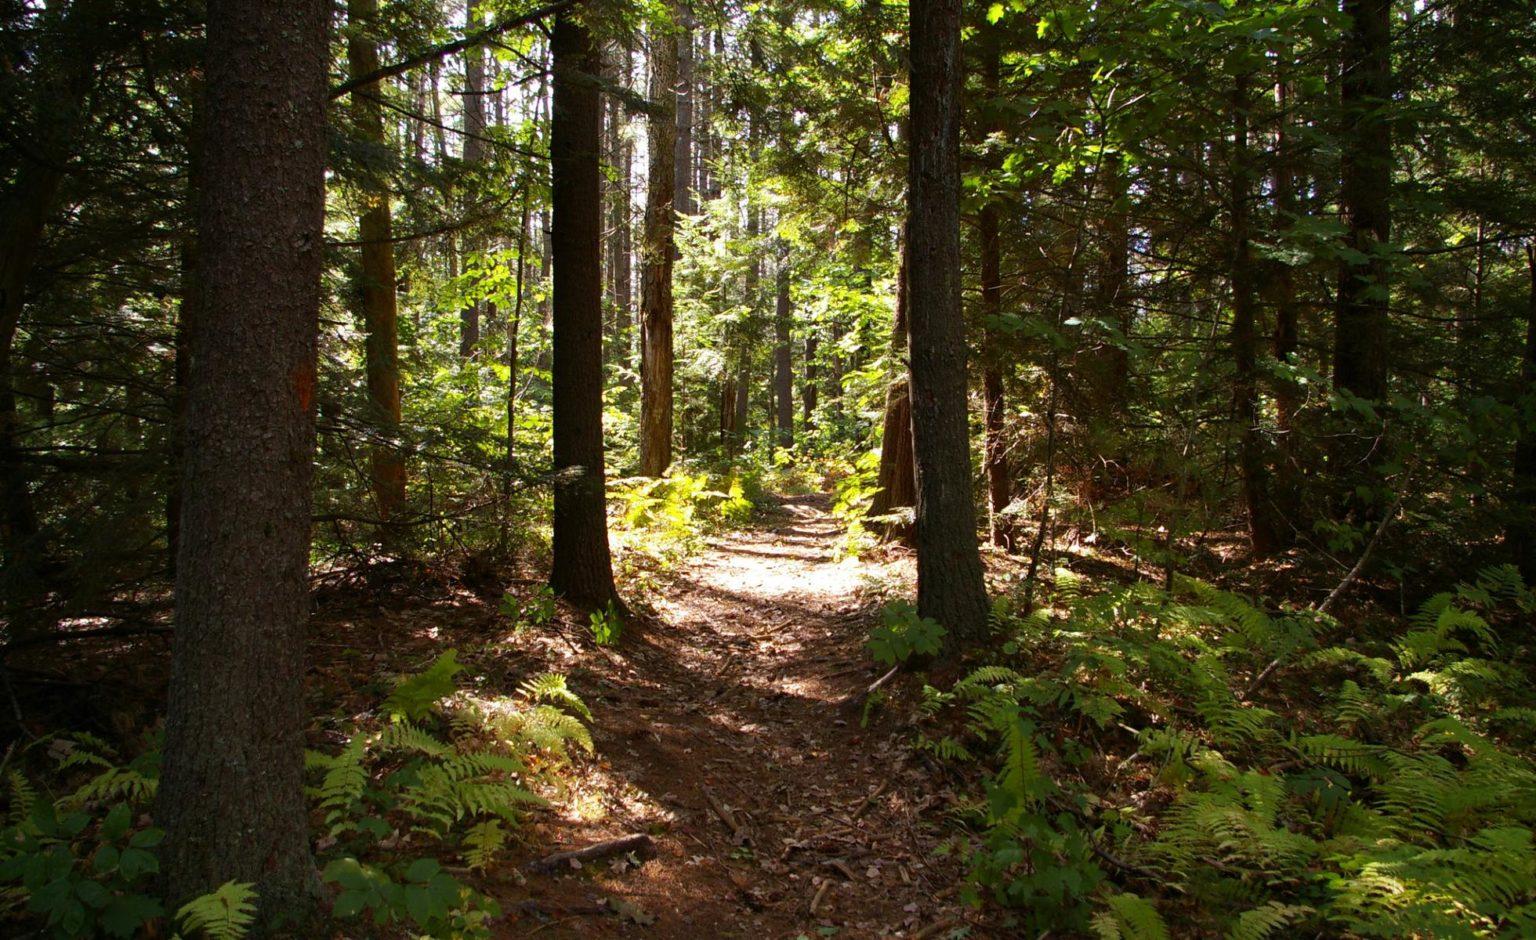 forest-walks-1536x940-1